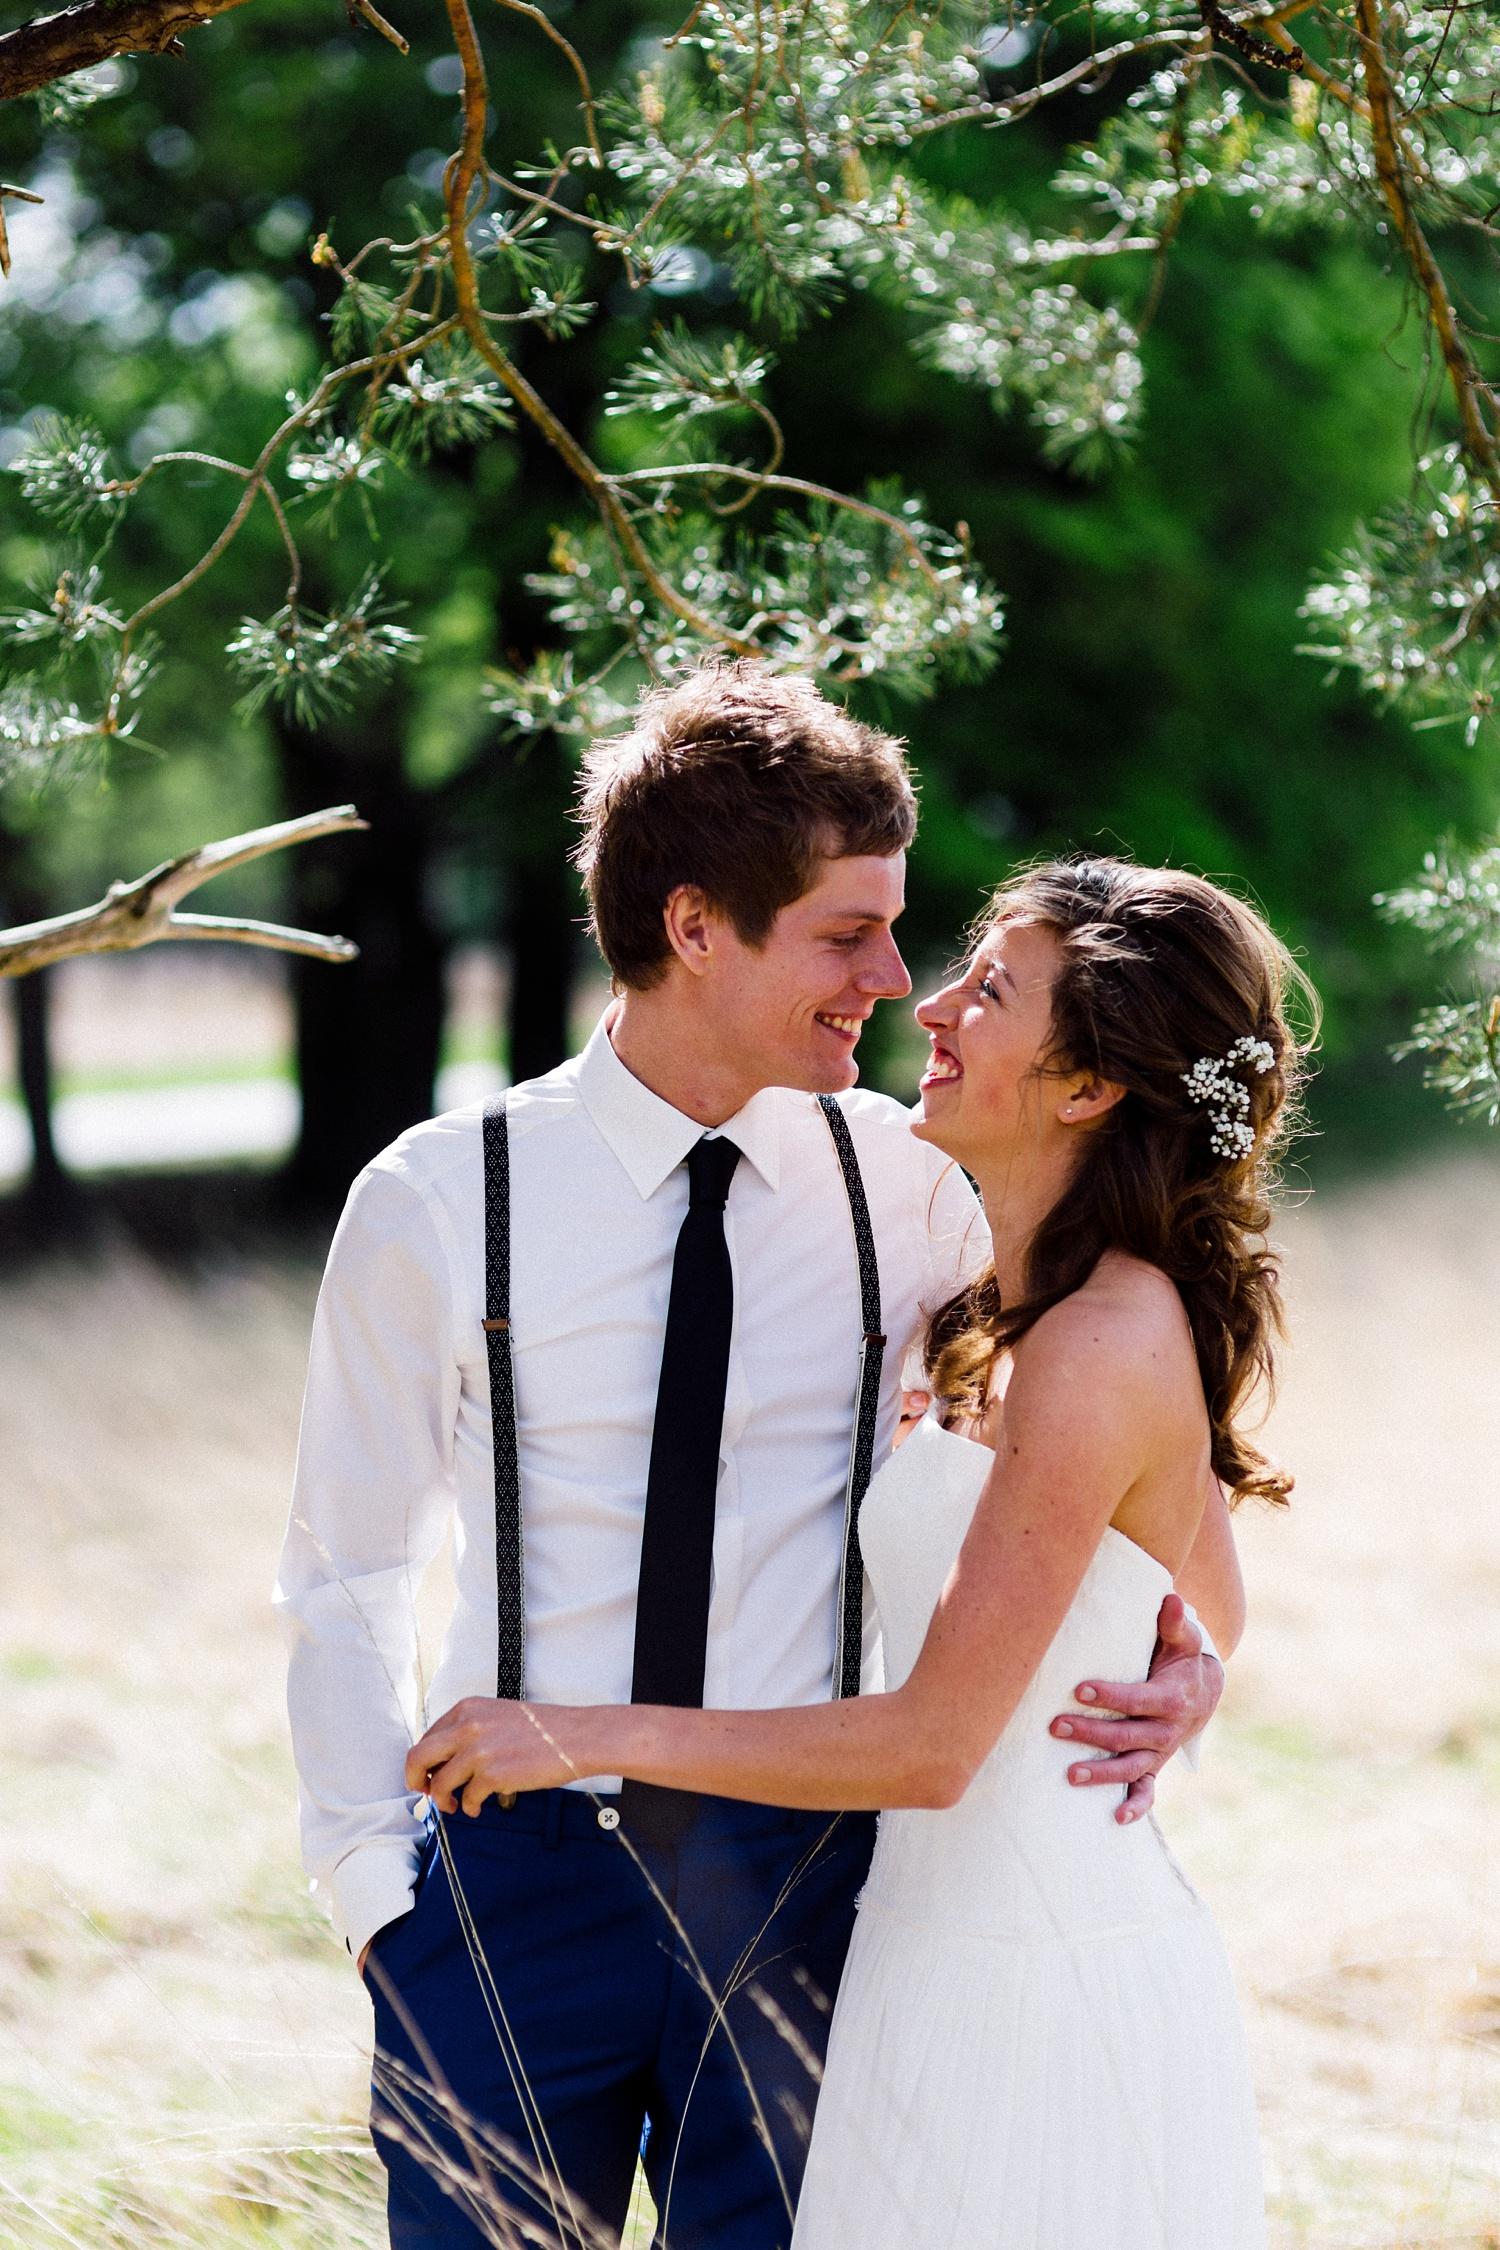 Vintage bruiloft Barneveld - Rob en Ellen_0009.jpg